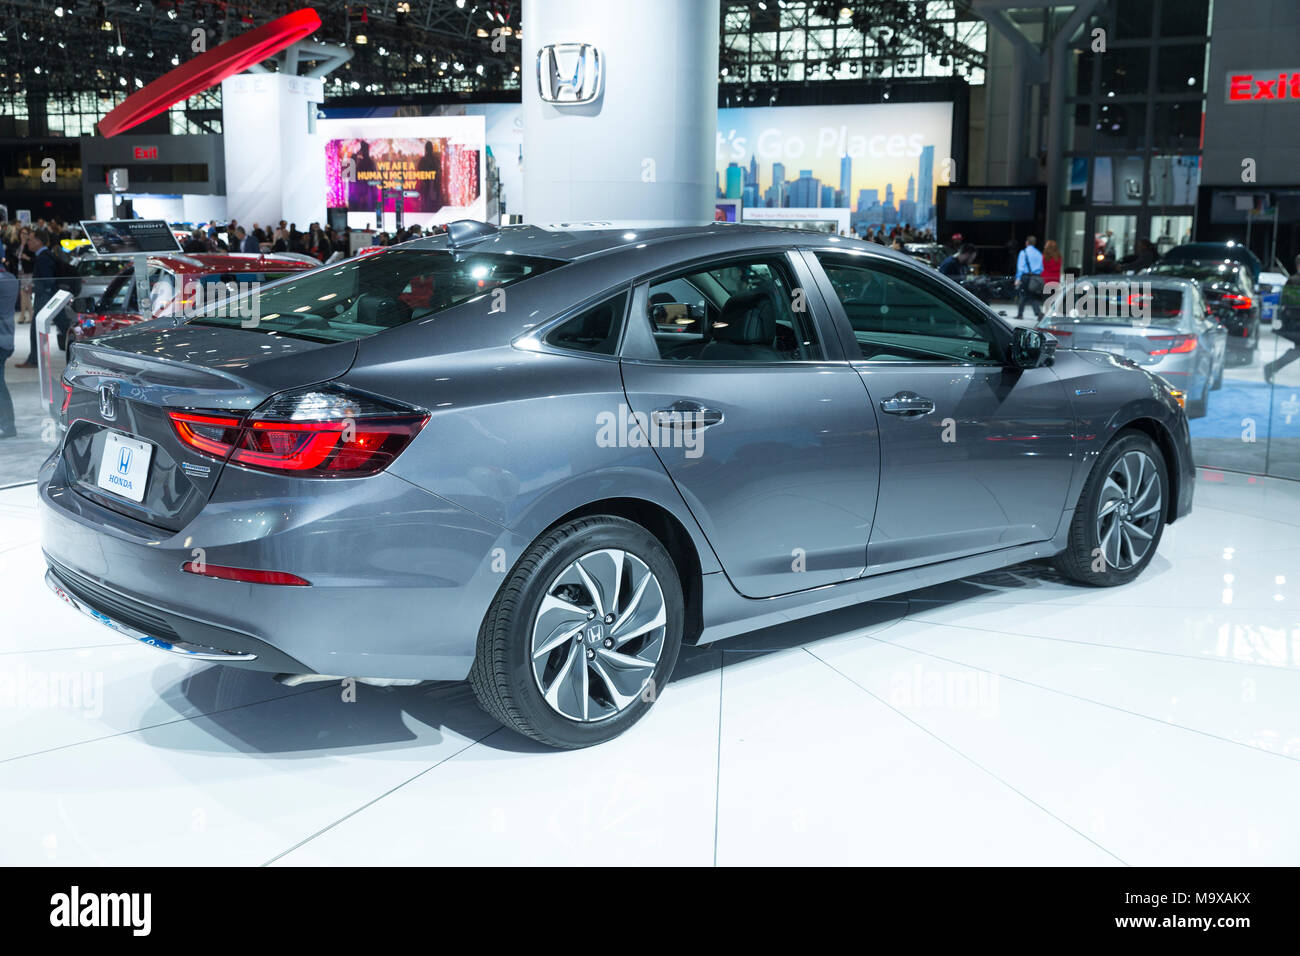 New York USA 28th Mar 2018 Honda Insight 2019 Sedan On Display At International Auto Show Jacob Javits Center Credit Lev Radin Alamy